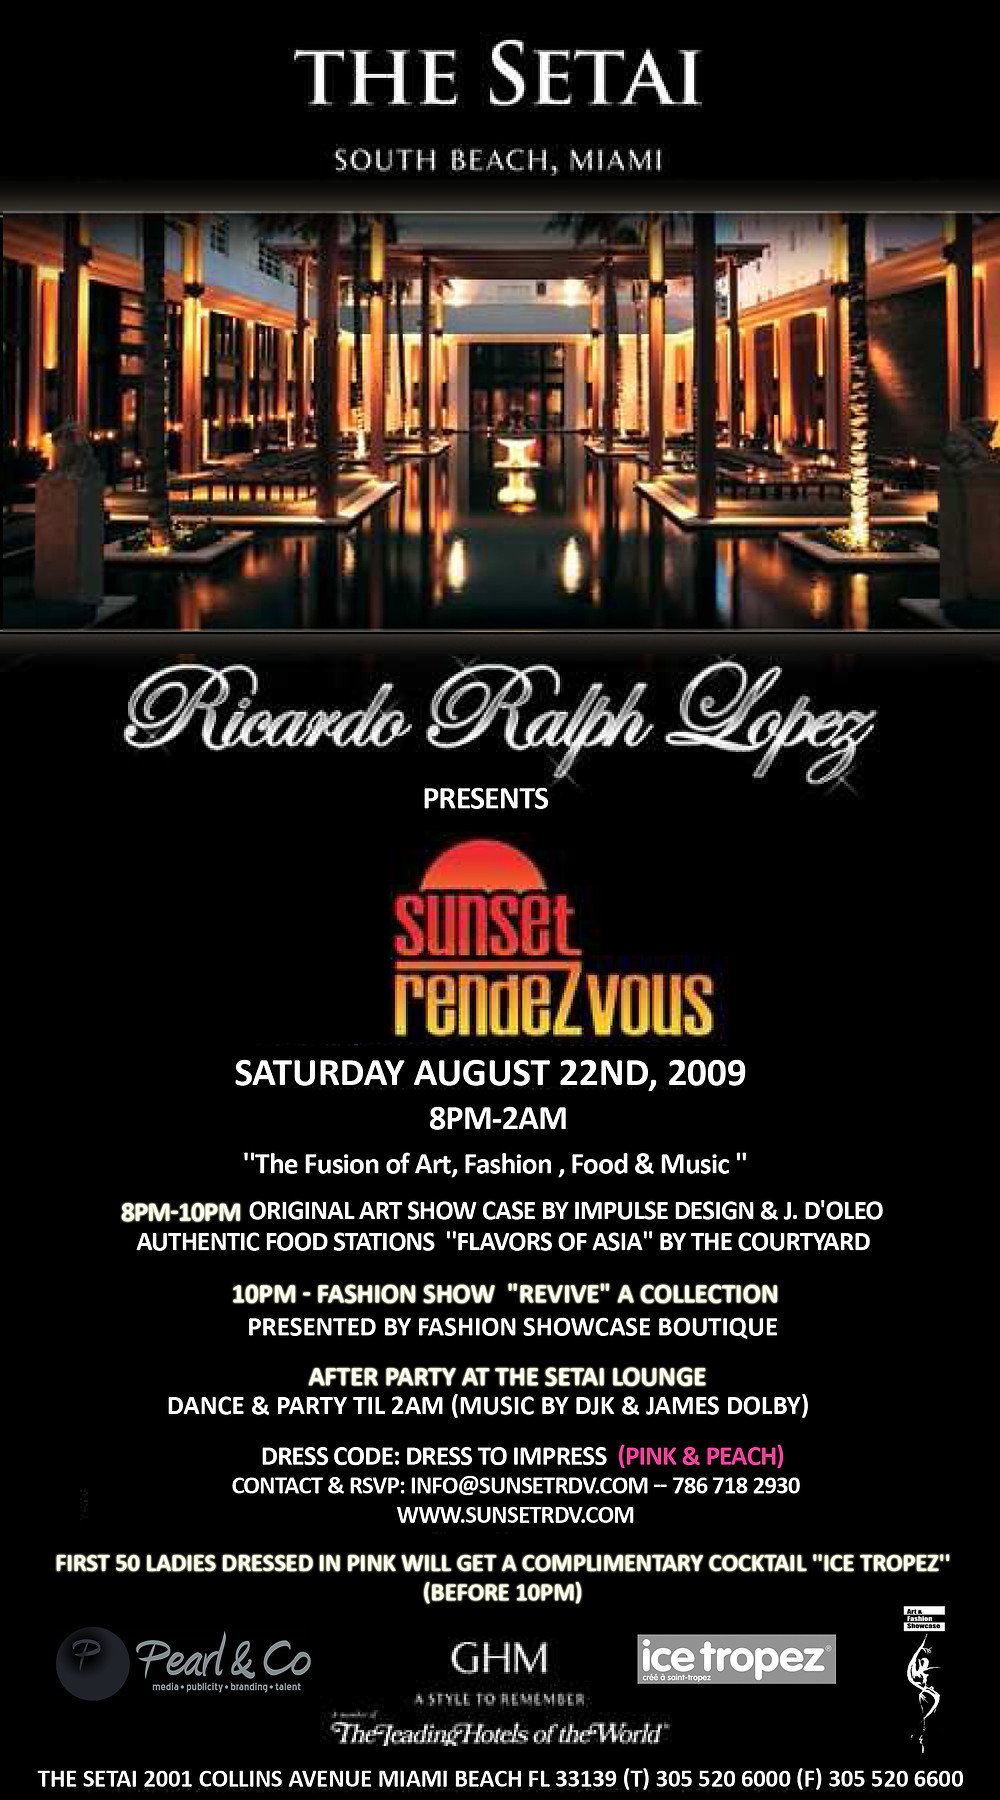 Update_Version_Sunset_RDV--By_Ricardo_Ralph_Lopez_Sat__Aug.22nd_8pm-2am.jpg